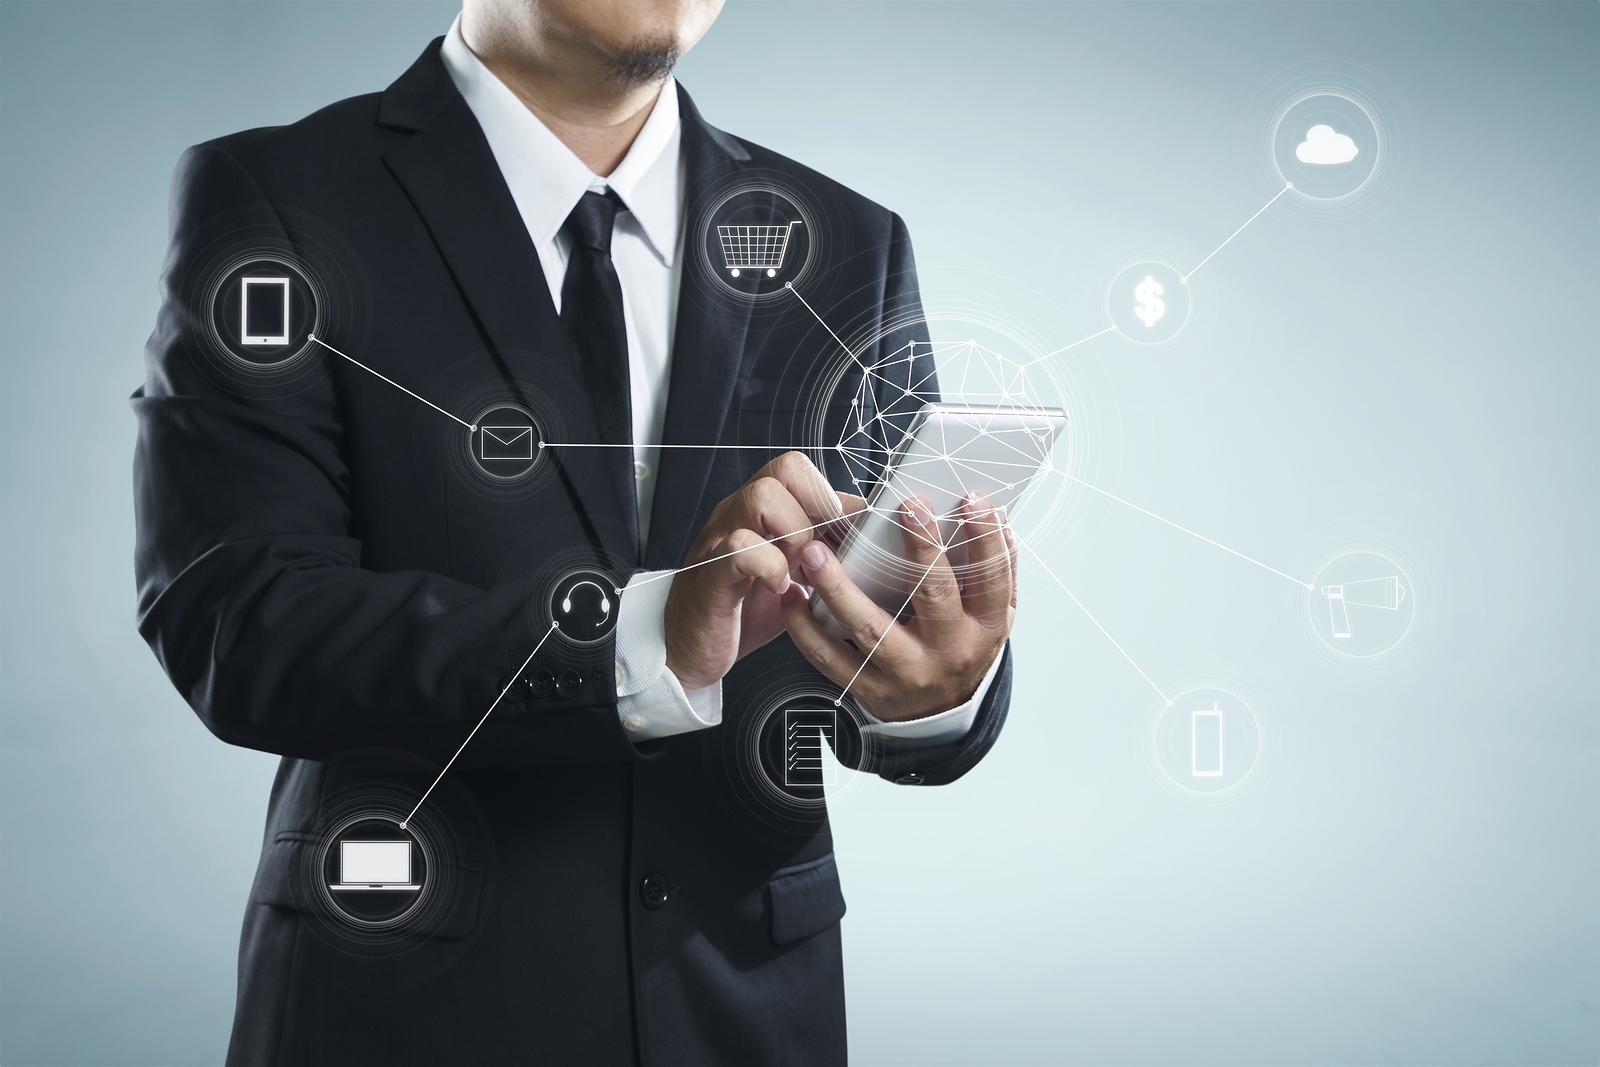 multichannel customer service